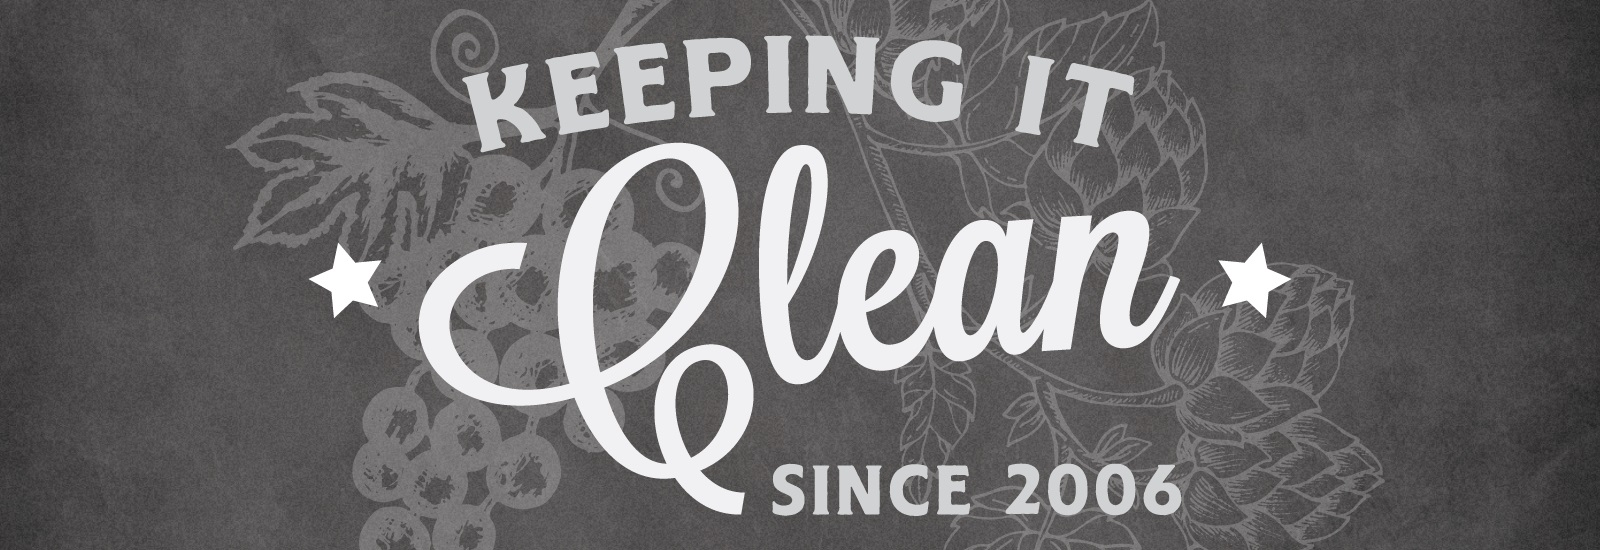 Keeping it Clean Since 2006